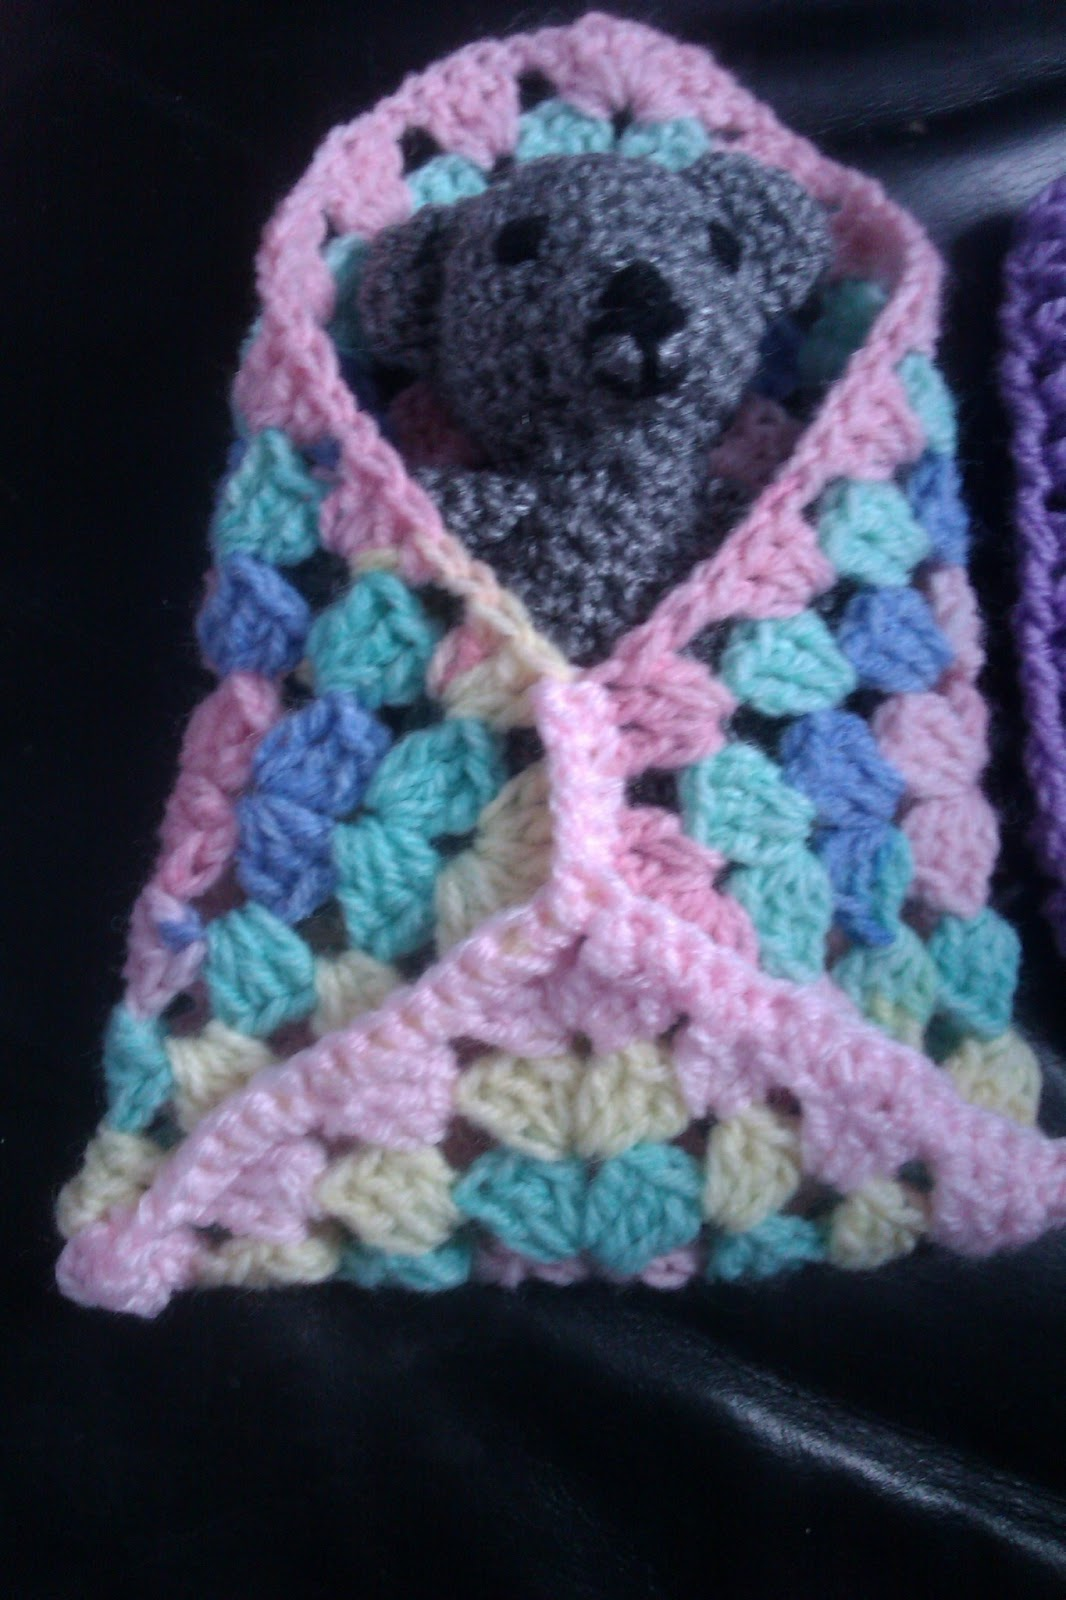 Free Crochet Granny Square Angel : mummyto2pinkys: Granny square crochet angel wrap pattern ...